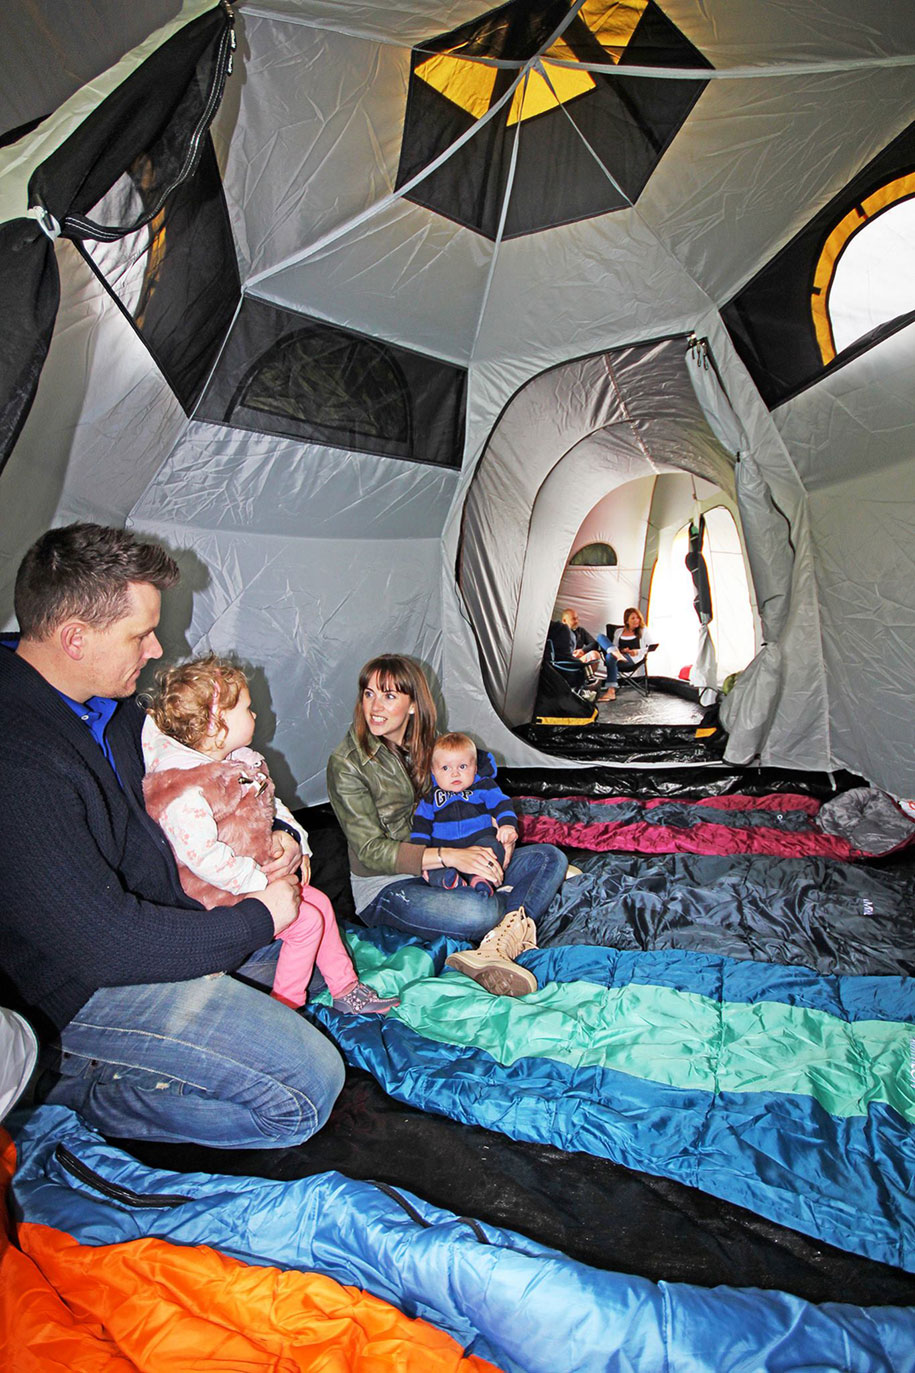 tende-campeggio-modulari-tunnel-pod-jason-thorpe-m2c-1